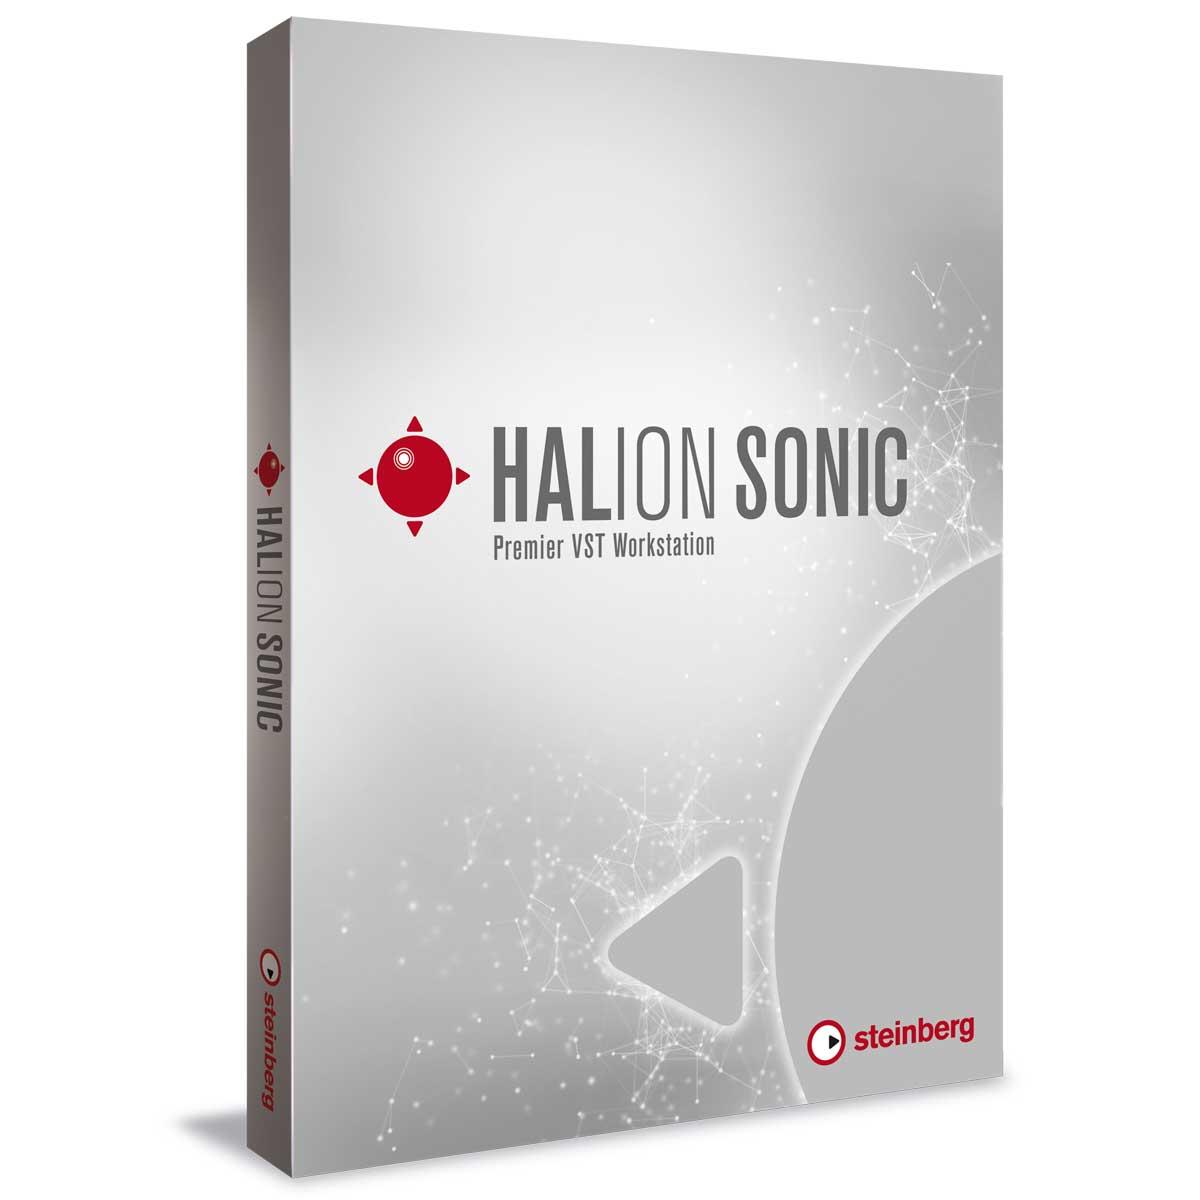 PCソフト, 音楽制作 Steinberg HALion Sonic